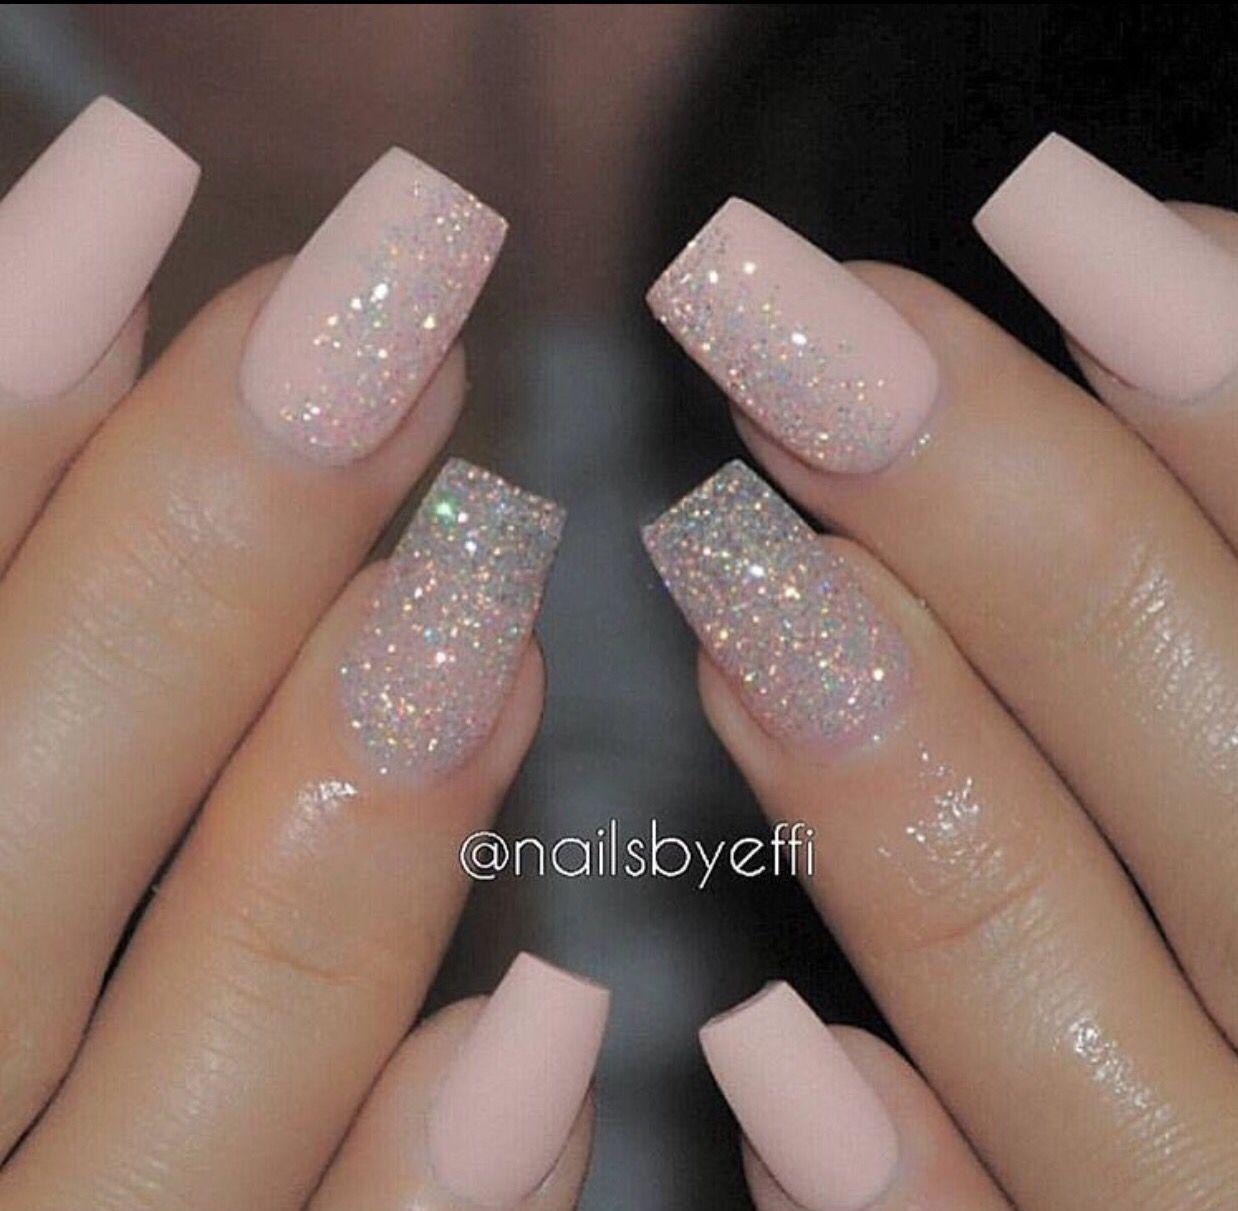 Light Pink Matte W Glitter Accent Or Gradient Accent On Each Nail Weddingmakeu Accent Glitter Gra In 2020 Blush Pink Nails Pink Wedding Nails Pink Sparkle Nails